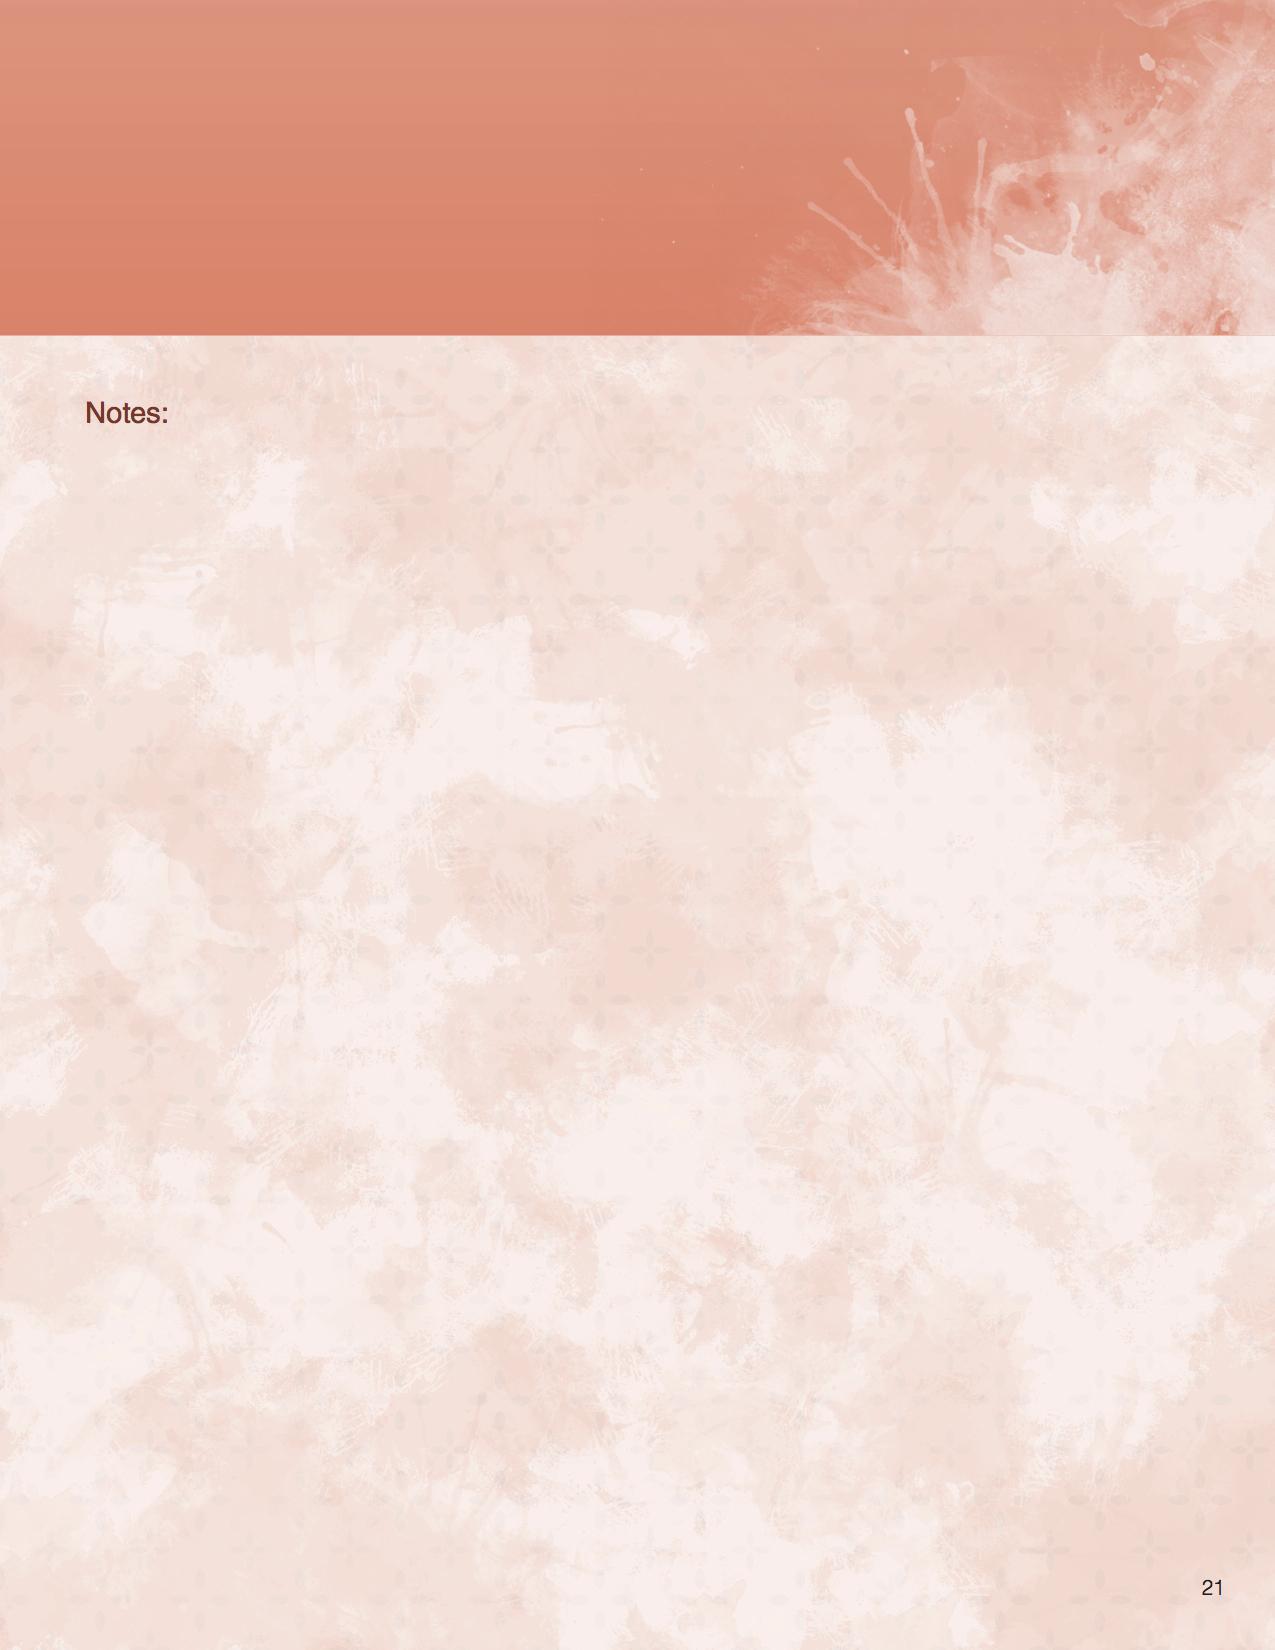 avanttot-print (2) (dragged) 23.jpeg